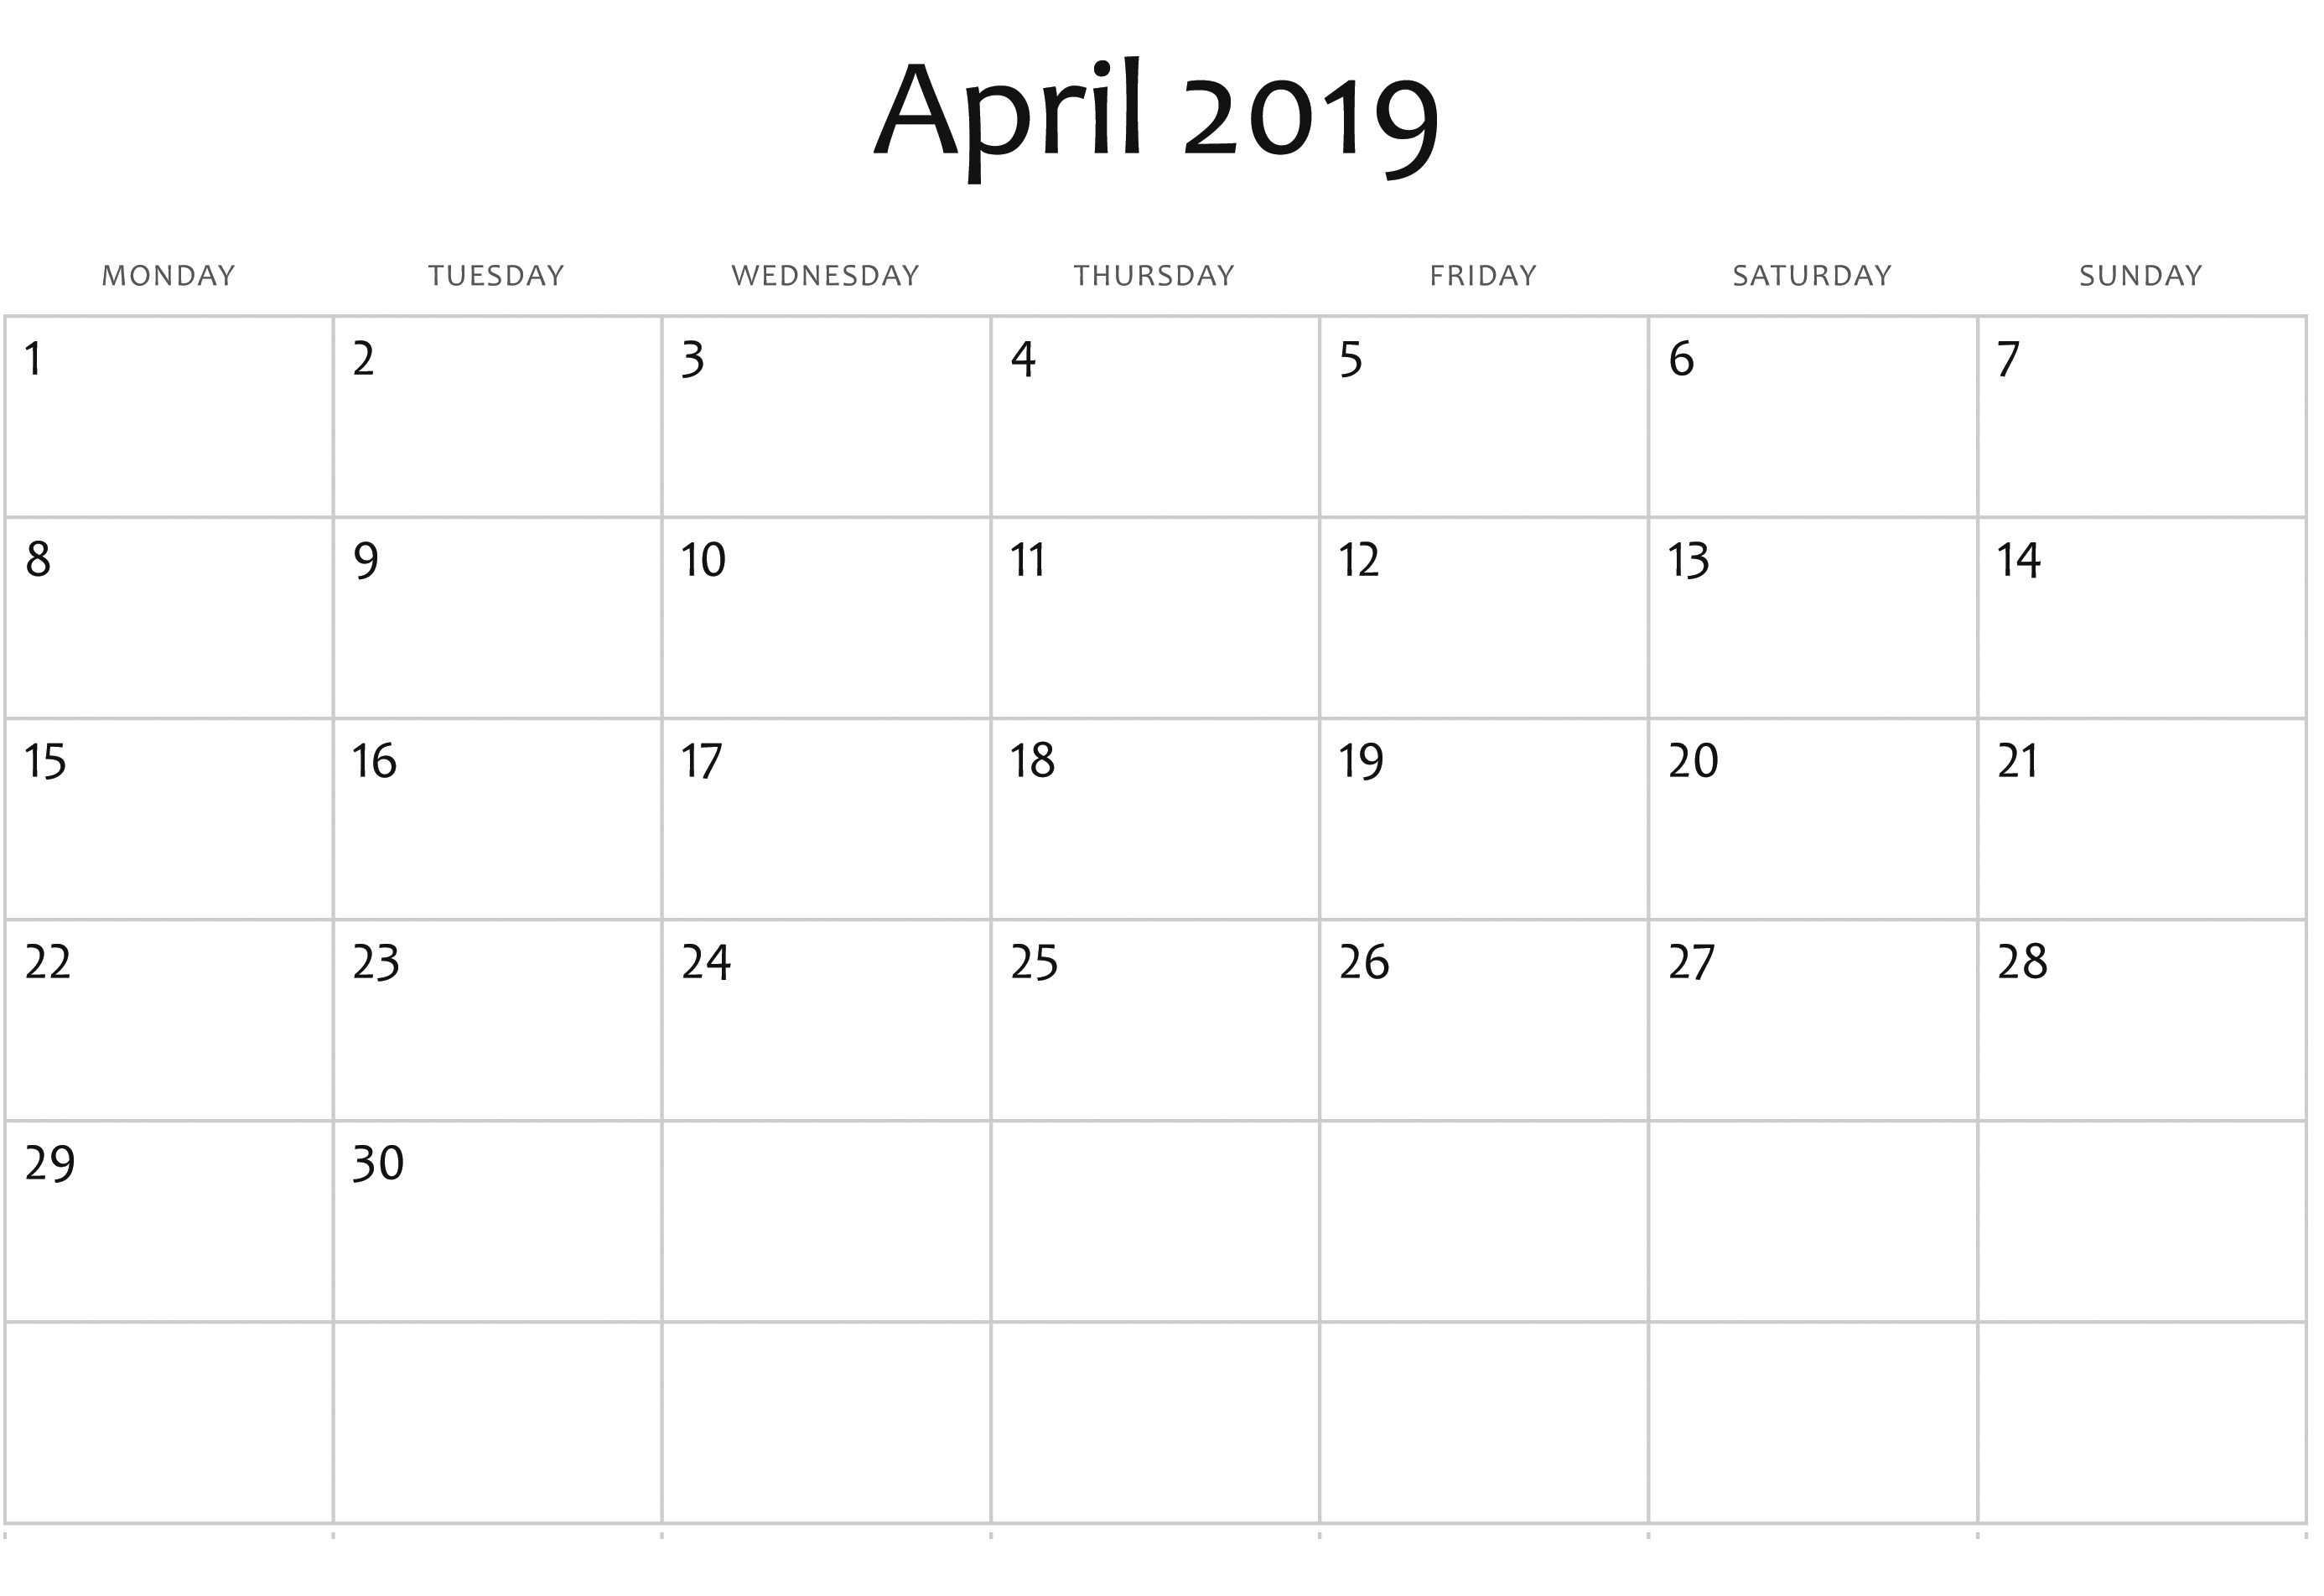 Blank April 2019 Editable Calendar Templates | Calendar 2019 Calendar 2019 Editable